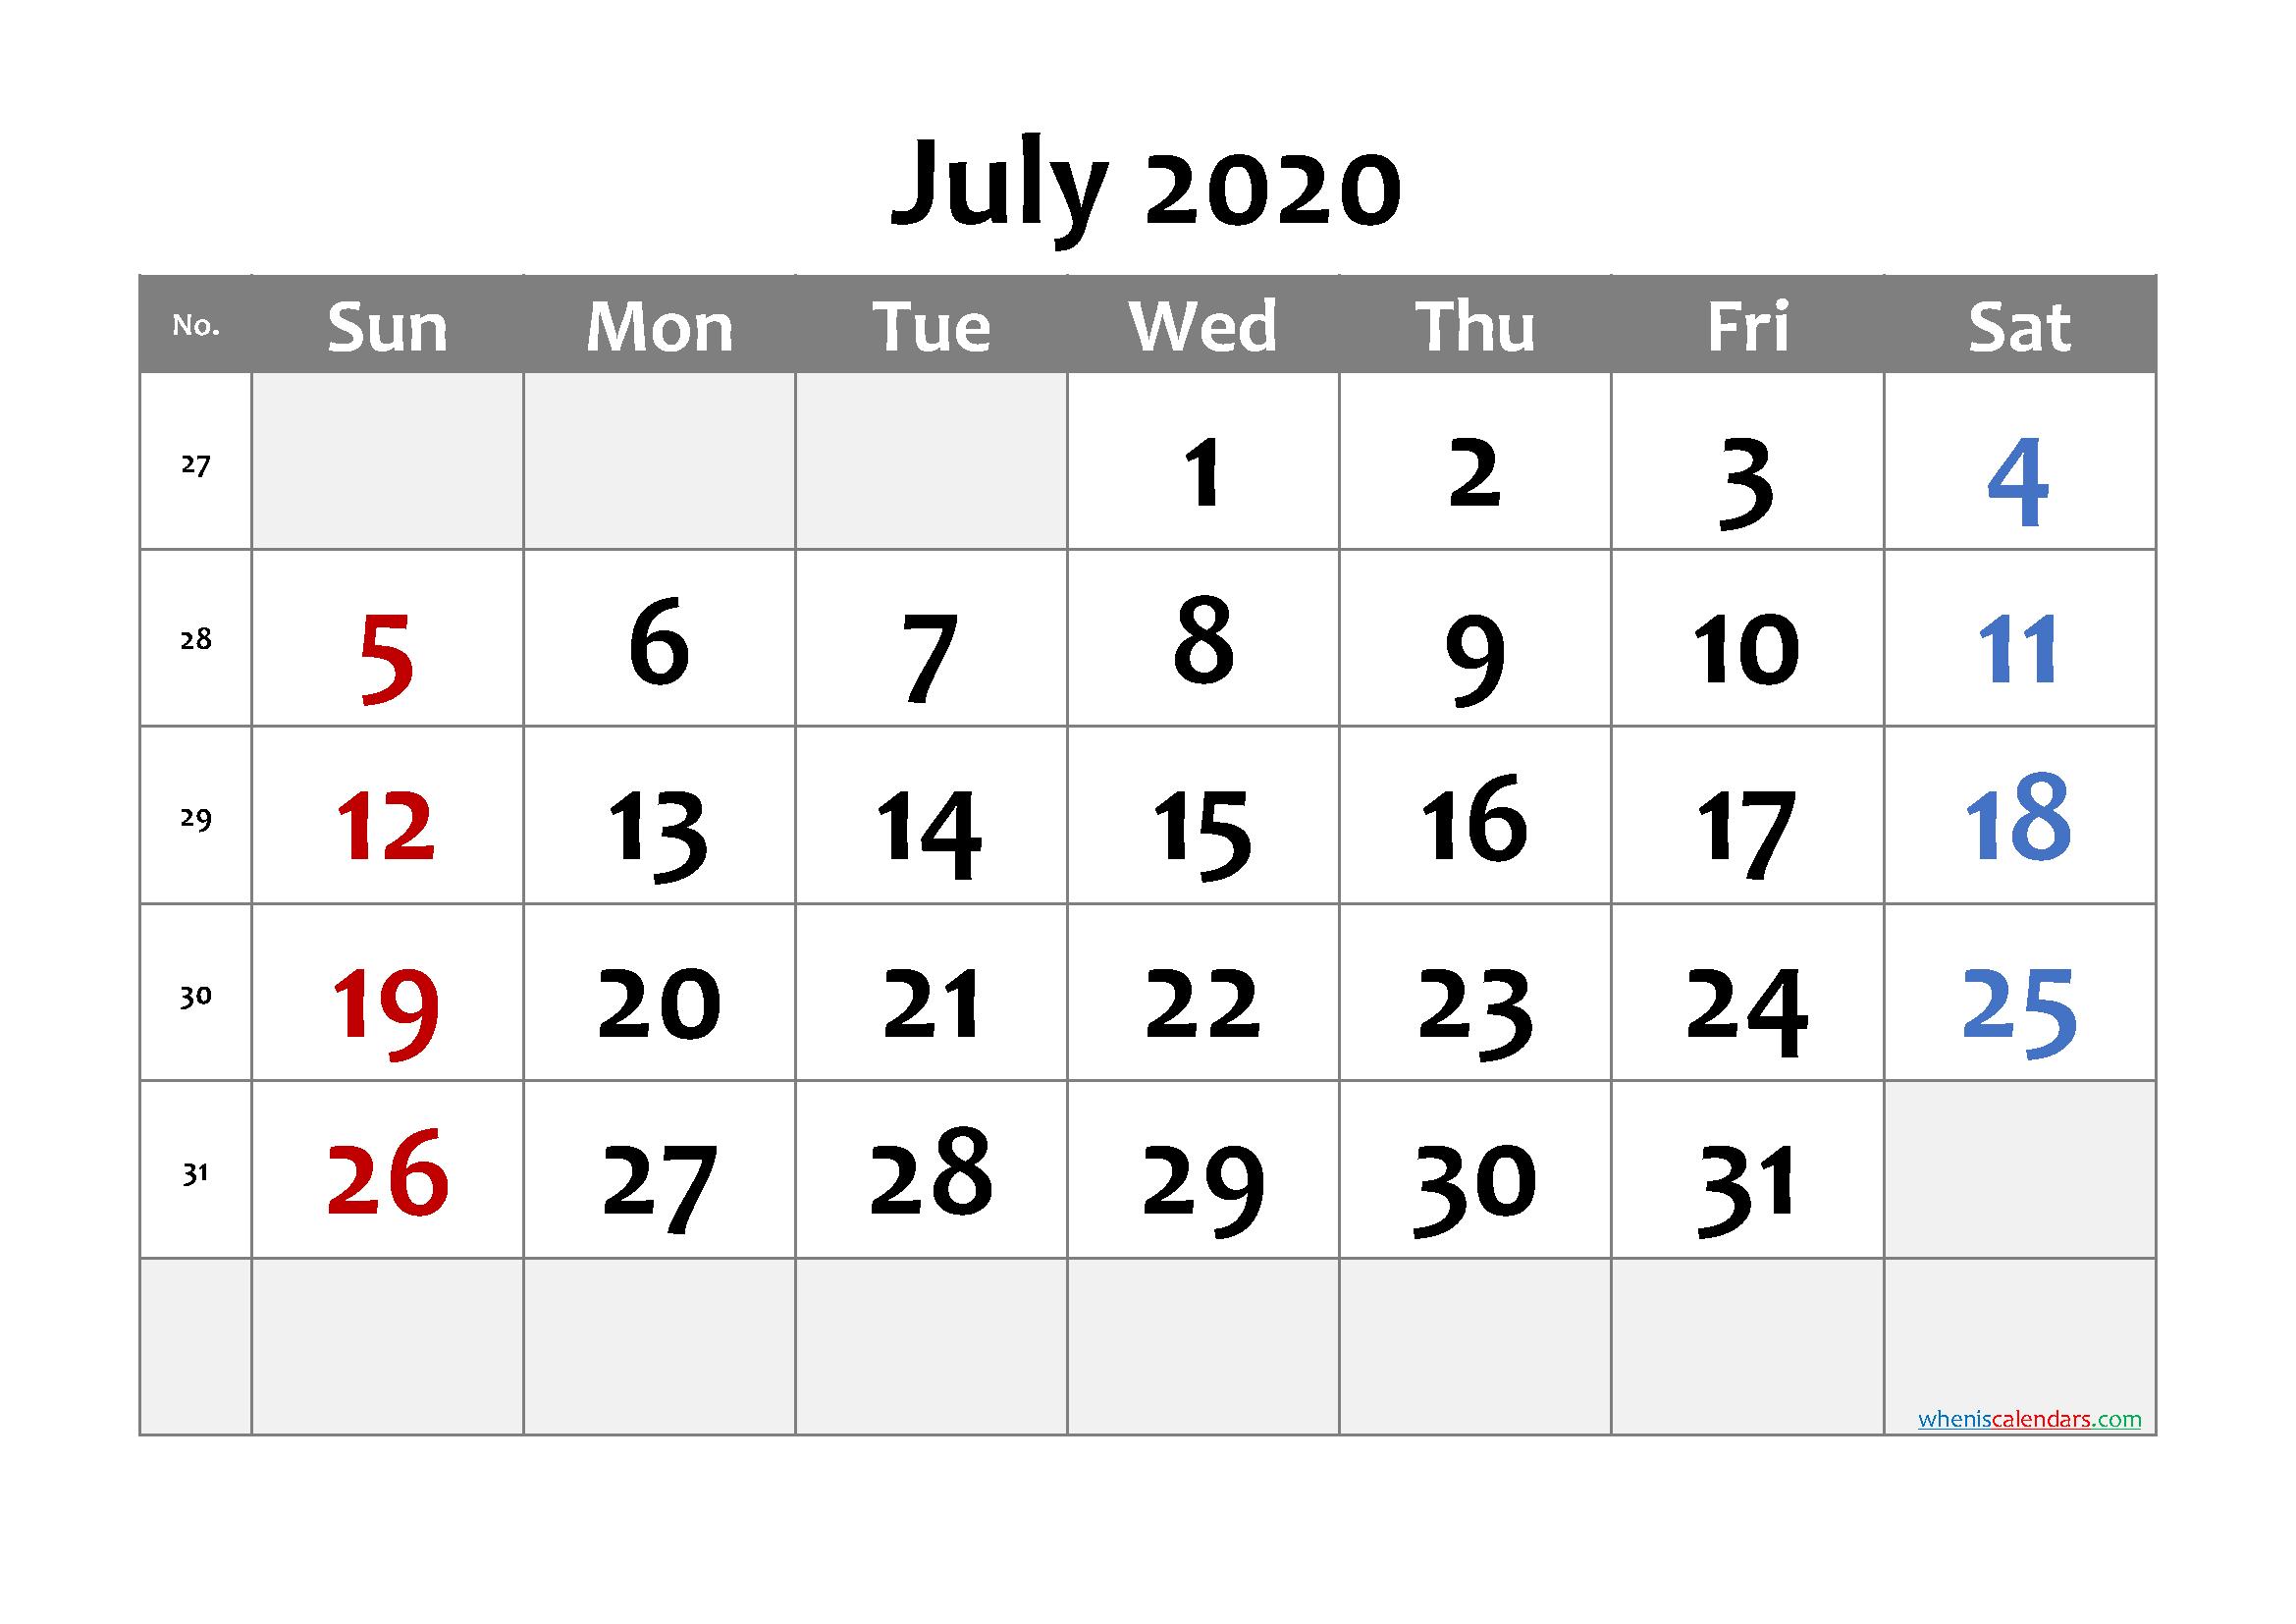 July 2020 Printable Calendar